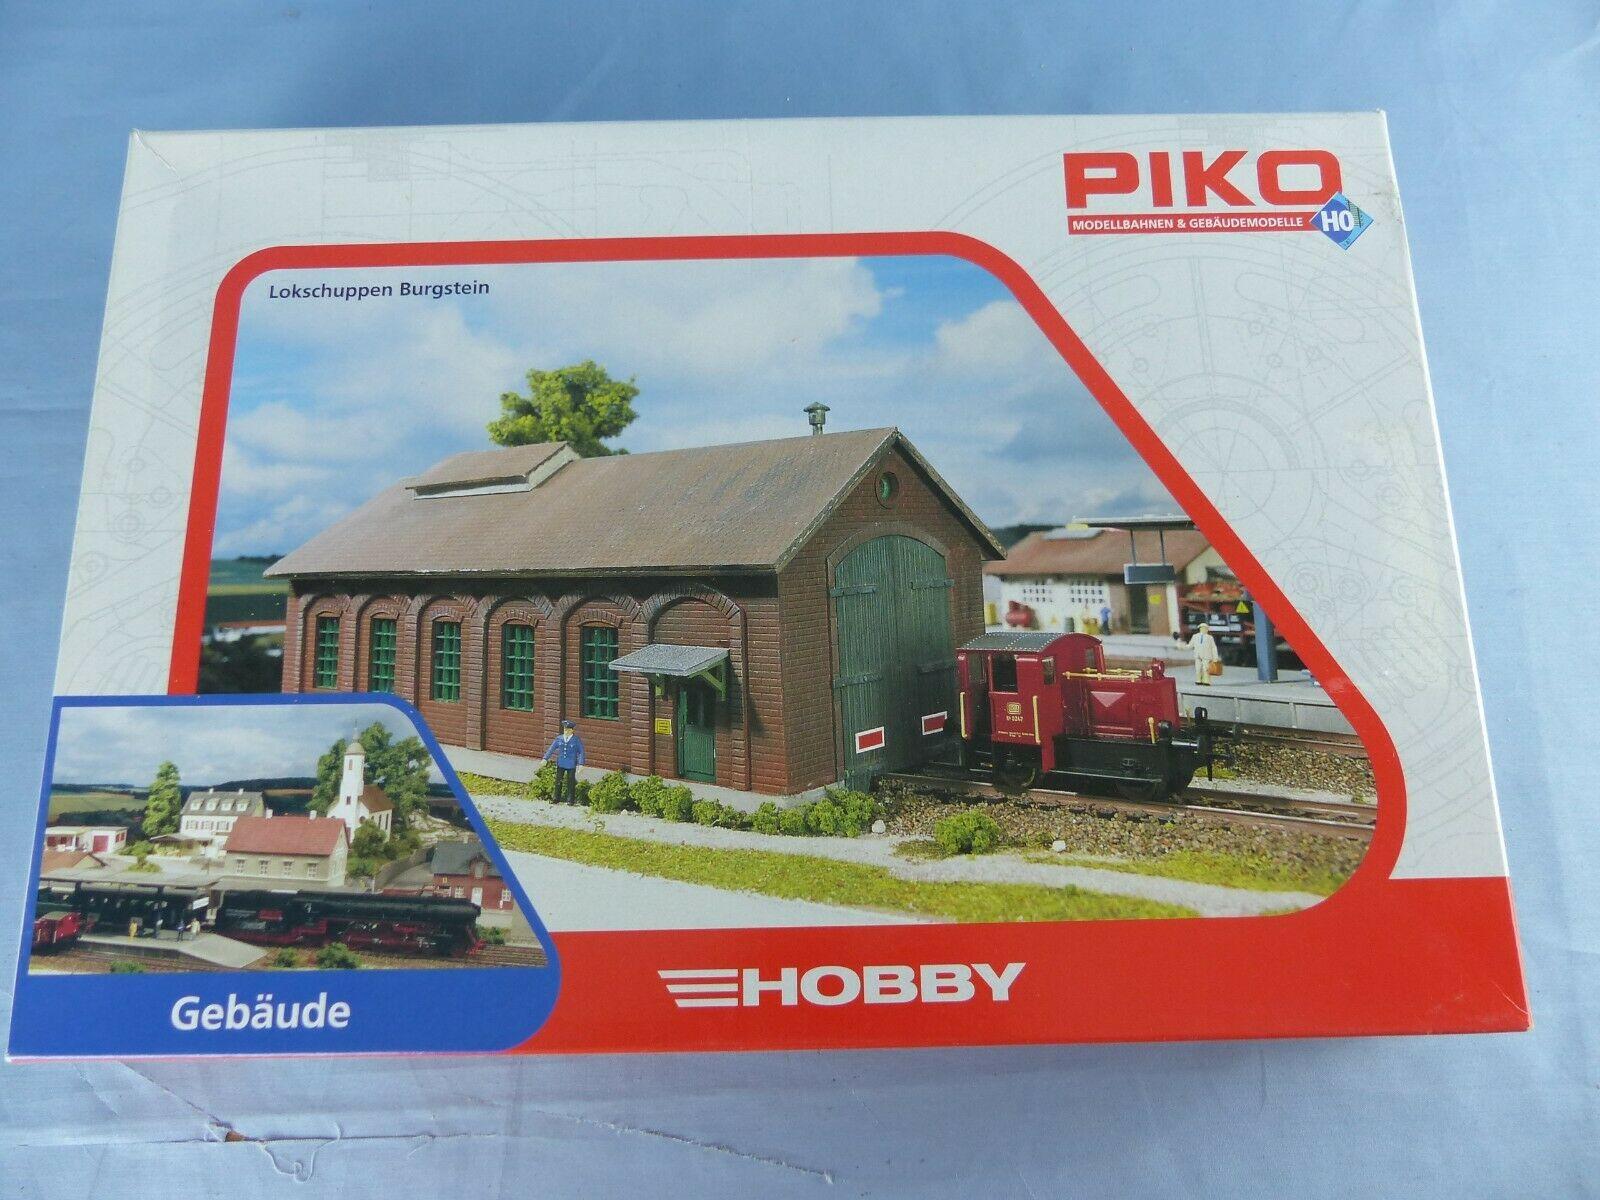 PIKO Hobby Burgstein Locomotive Shed Kit HO Gauge 61823